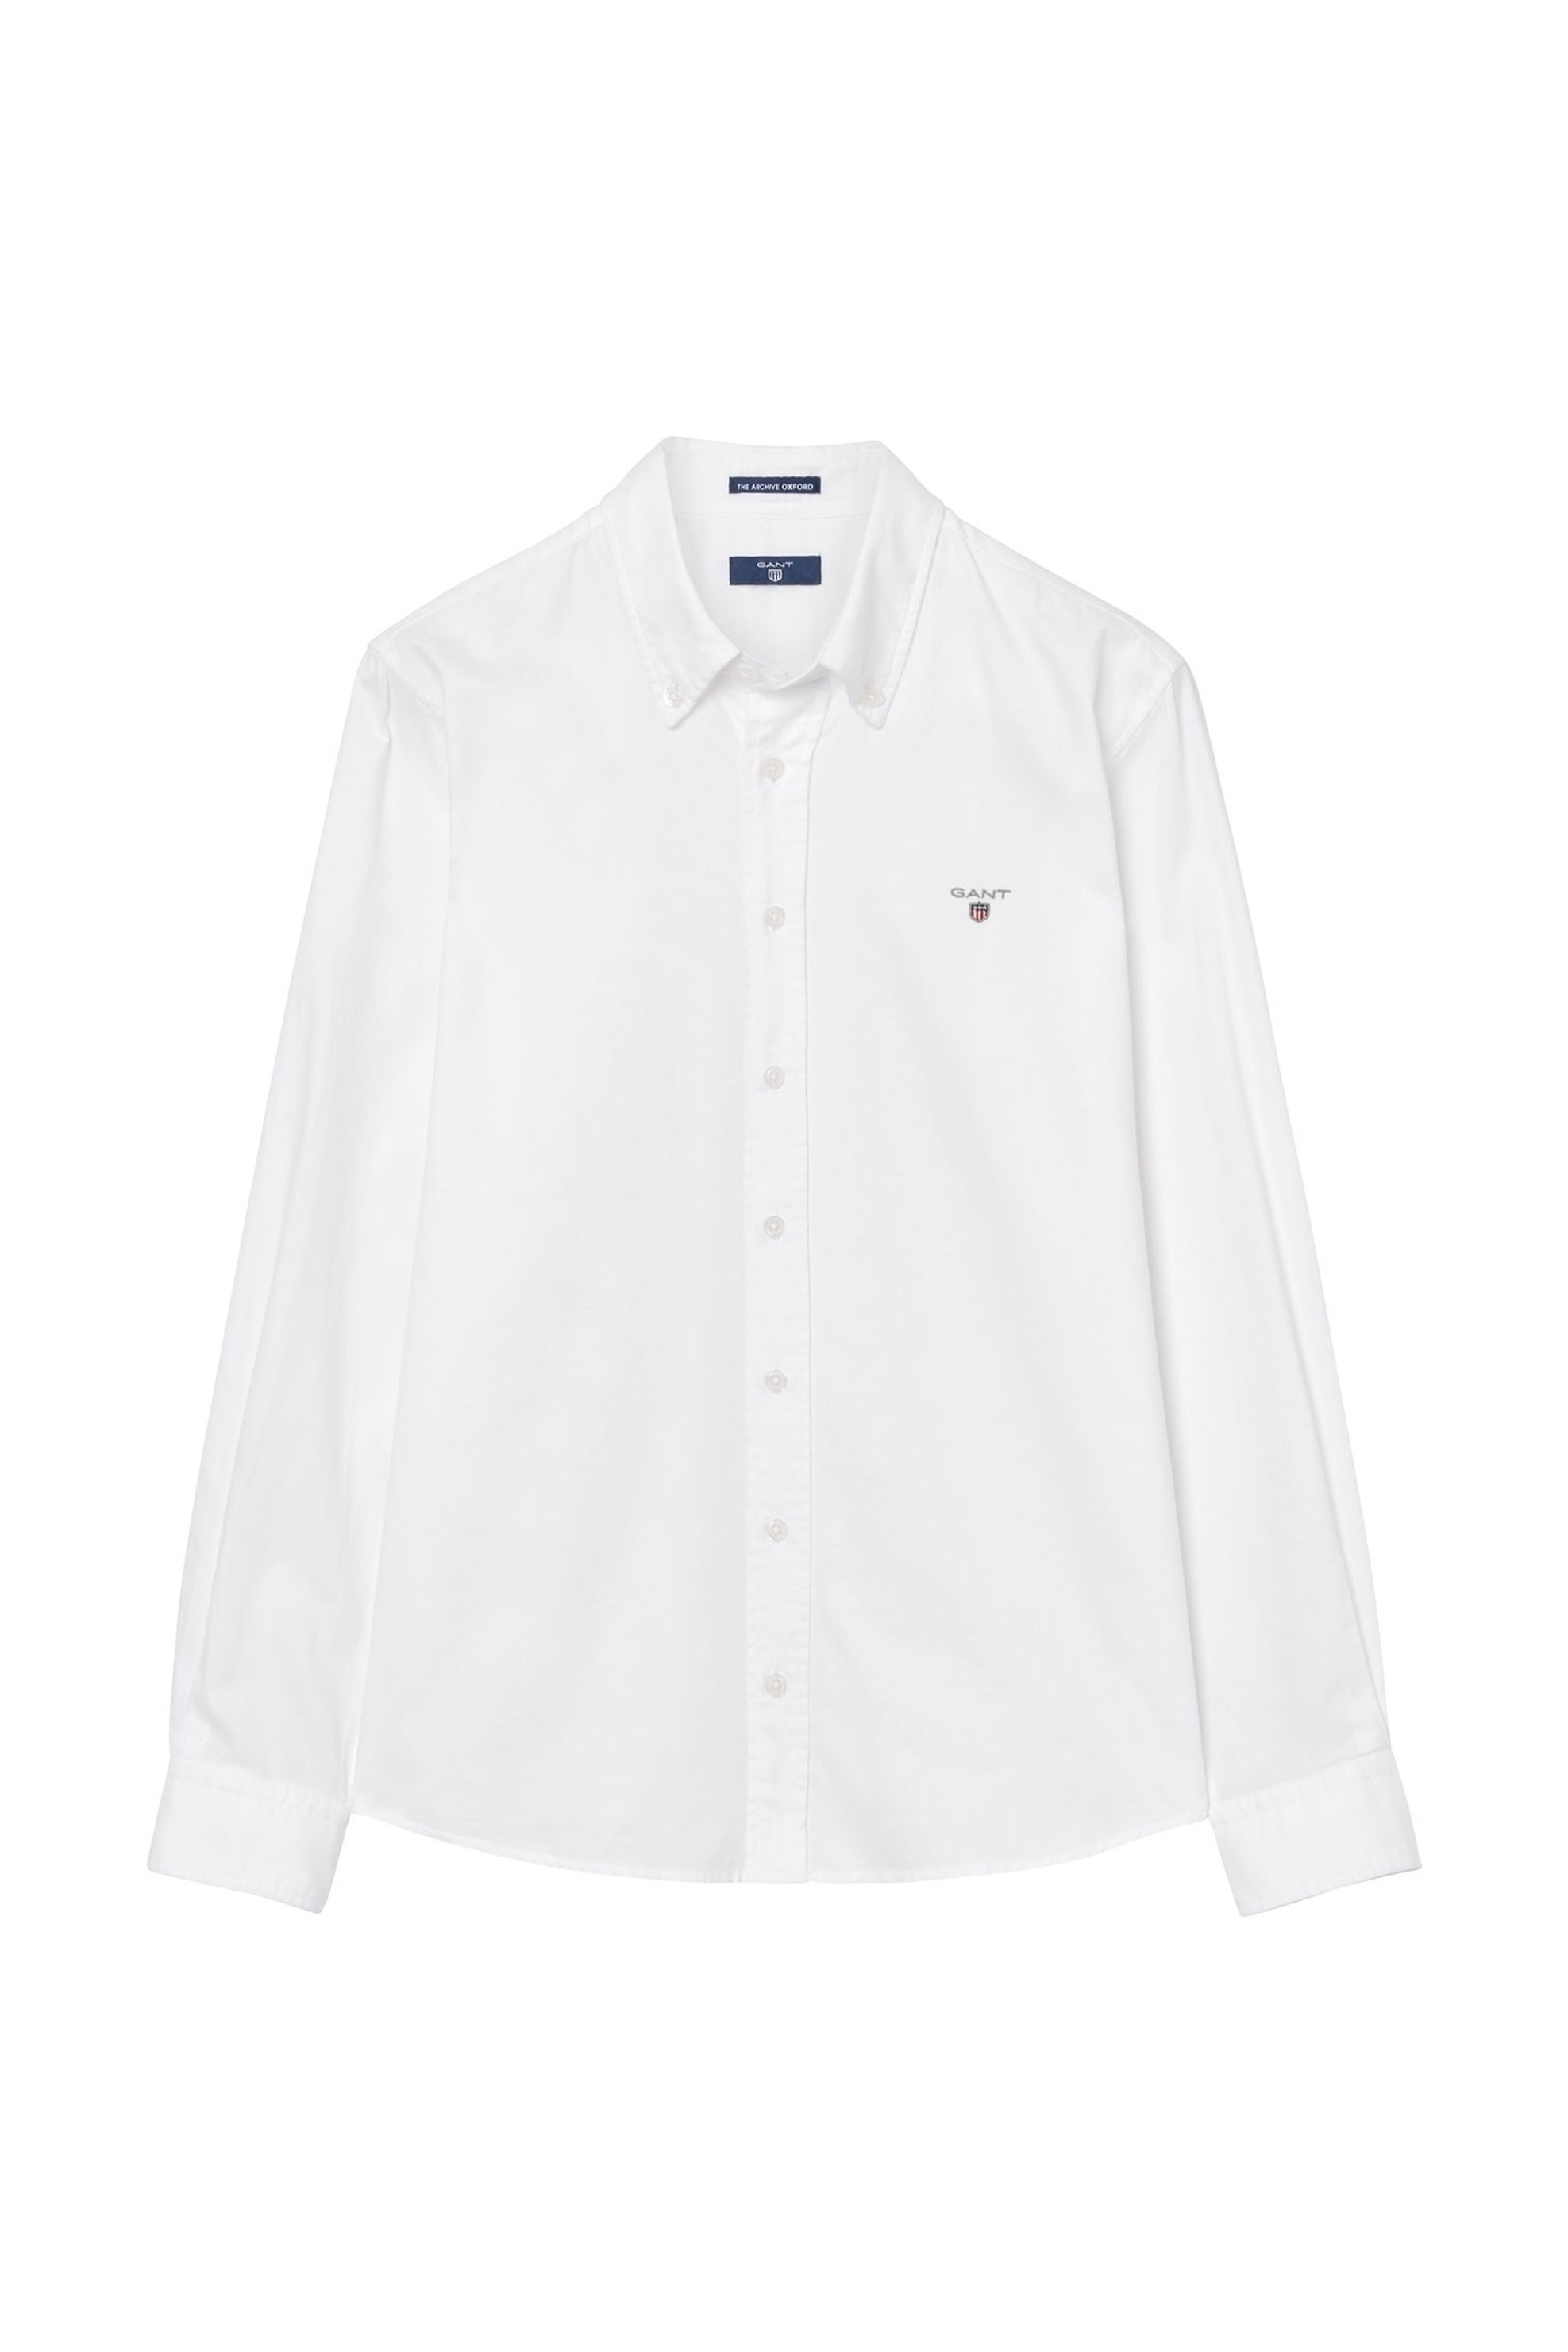 4653e02622d Notos Παιδικό μονόχρωμο πουκάμισο GANT - 930390 - Λευκό